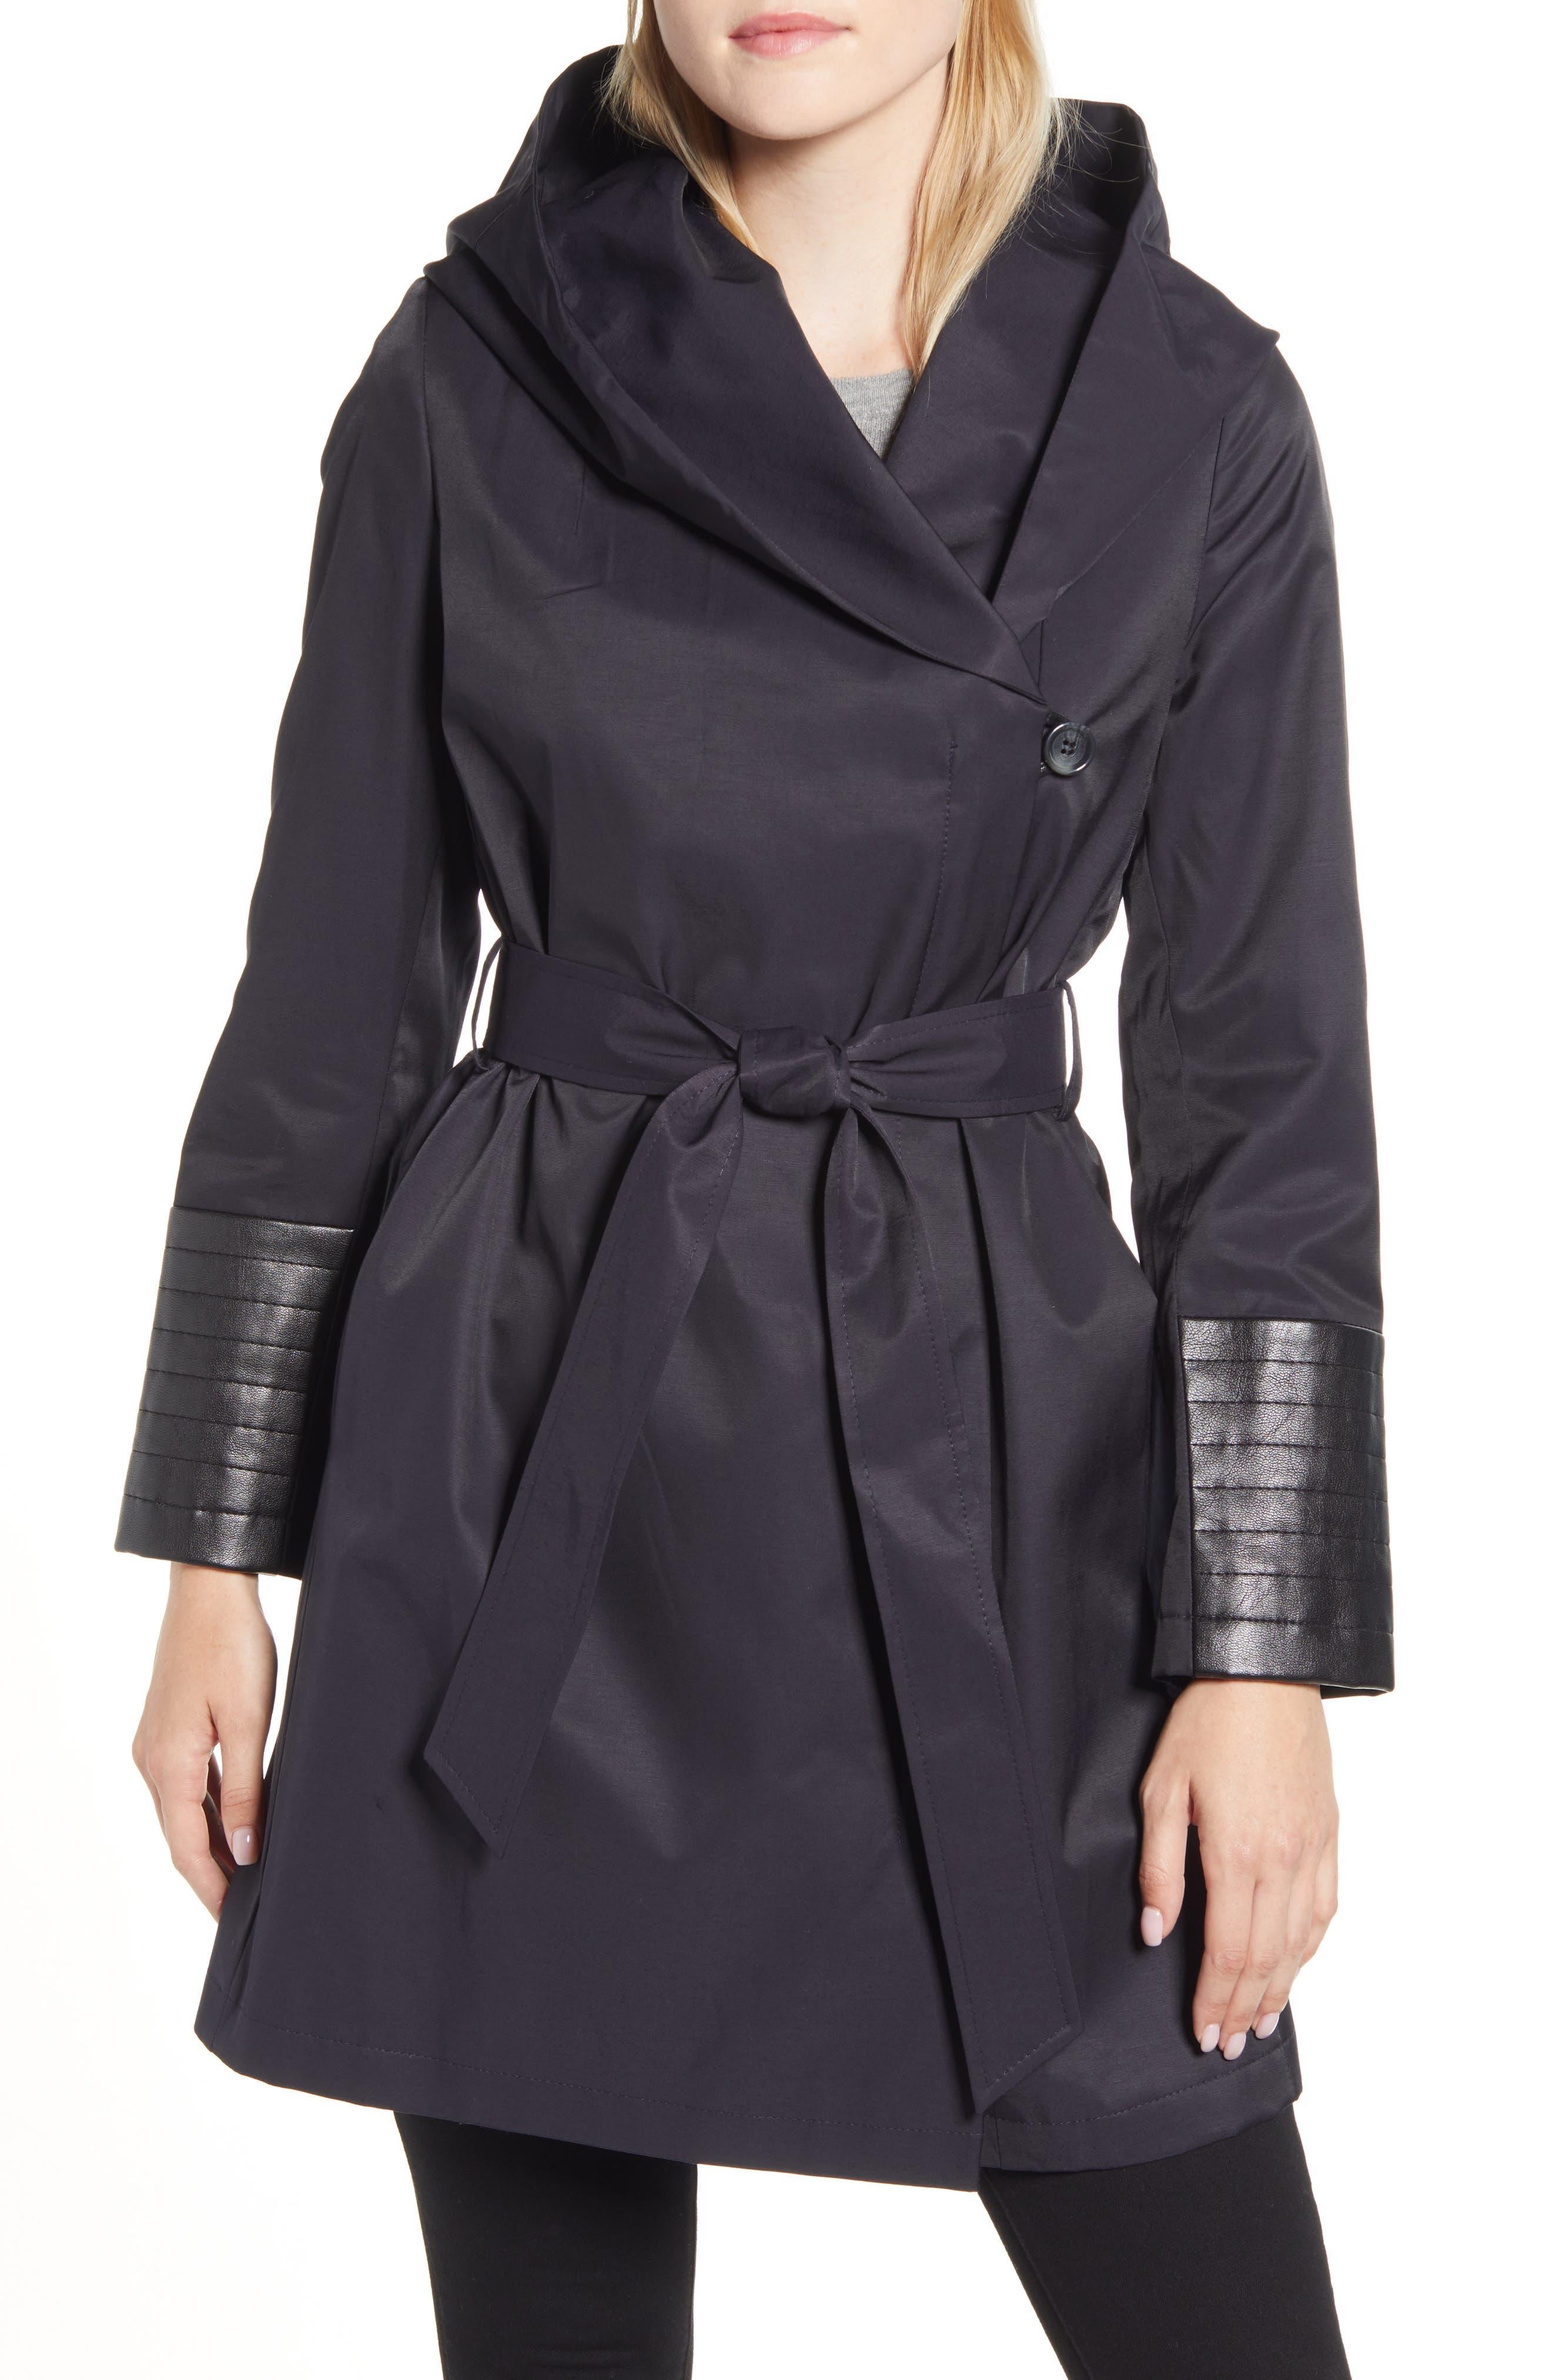 Via Spiga Faux Leather Trim Rain Jacket